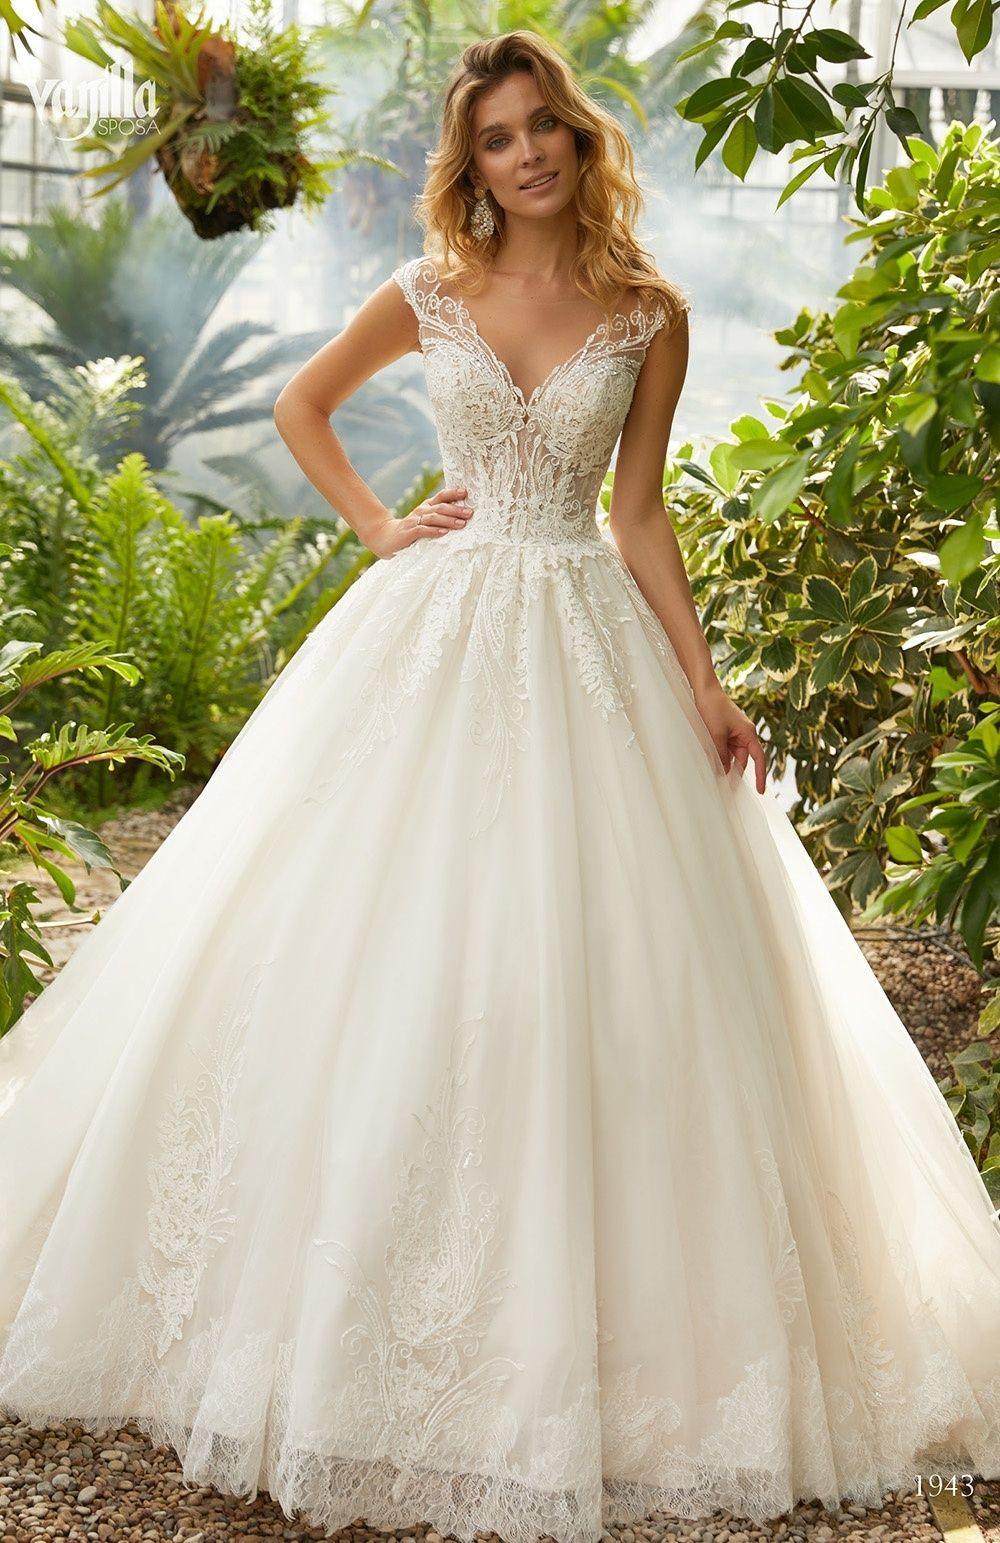 Robe de mariée Vanilla Sposa 15 Modèle  Wedding dresses